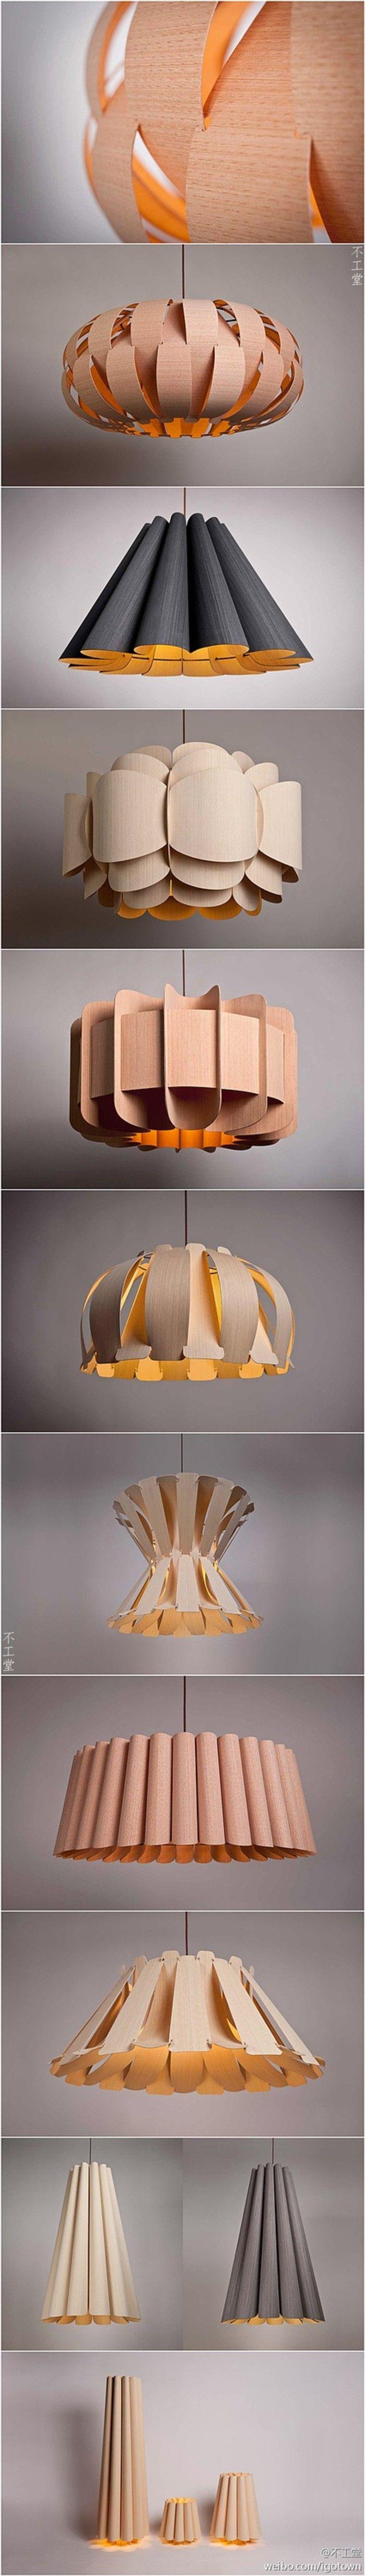 Beautiful Cut And Folded Paper Lamp Shades